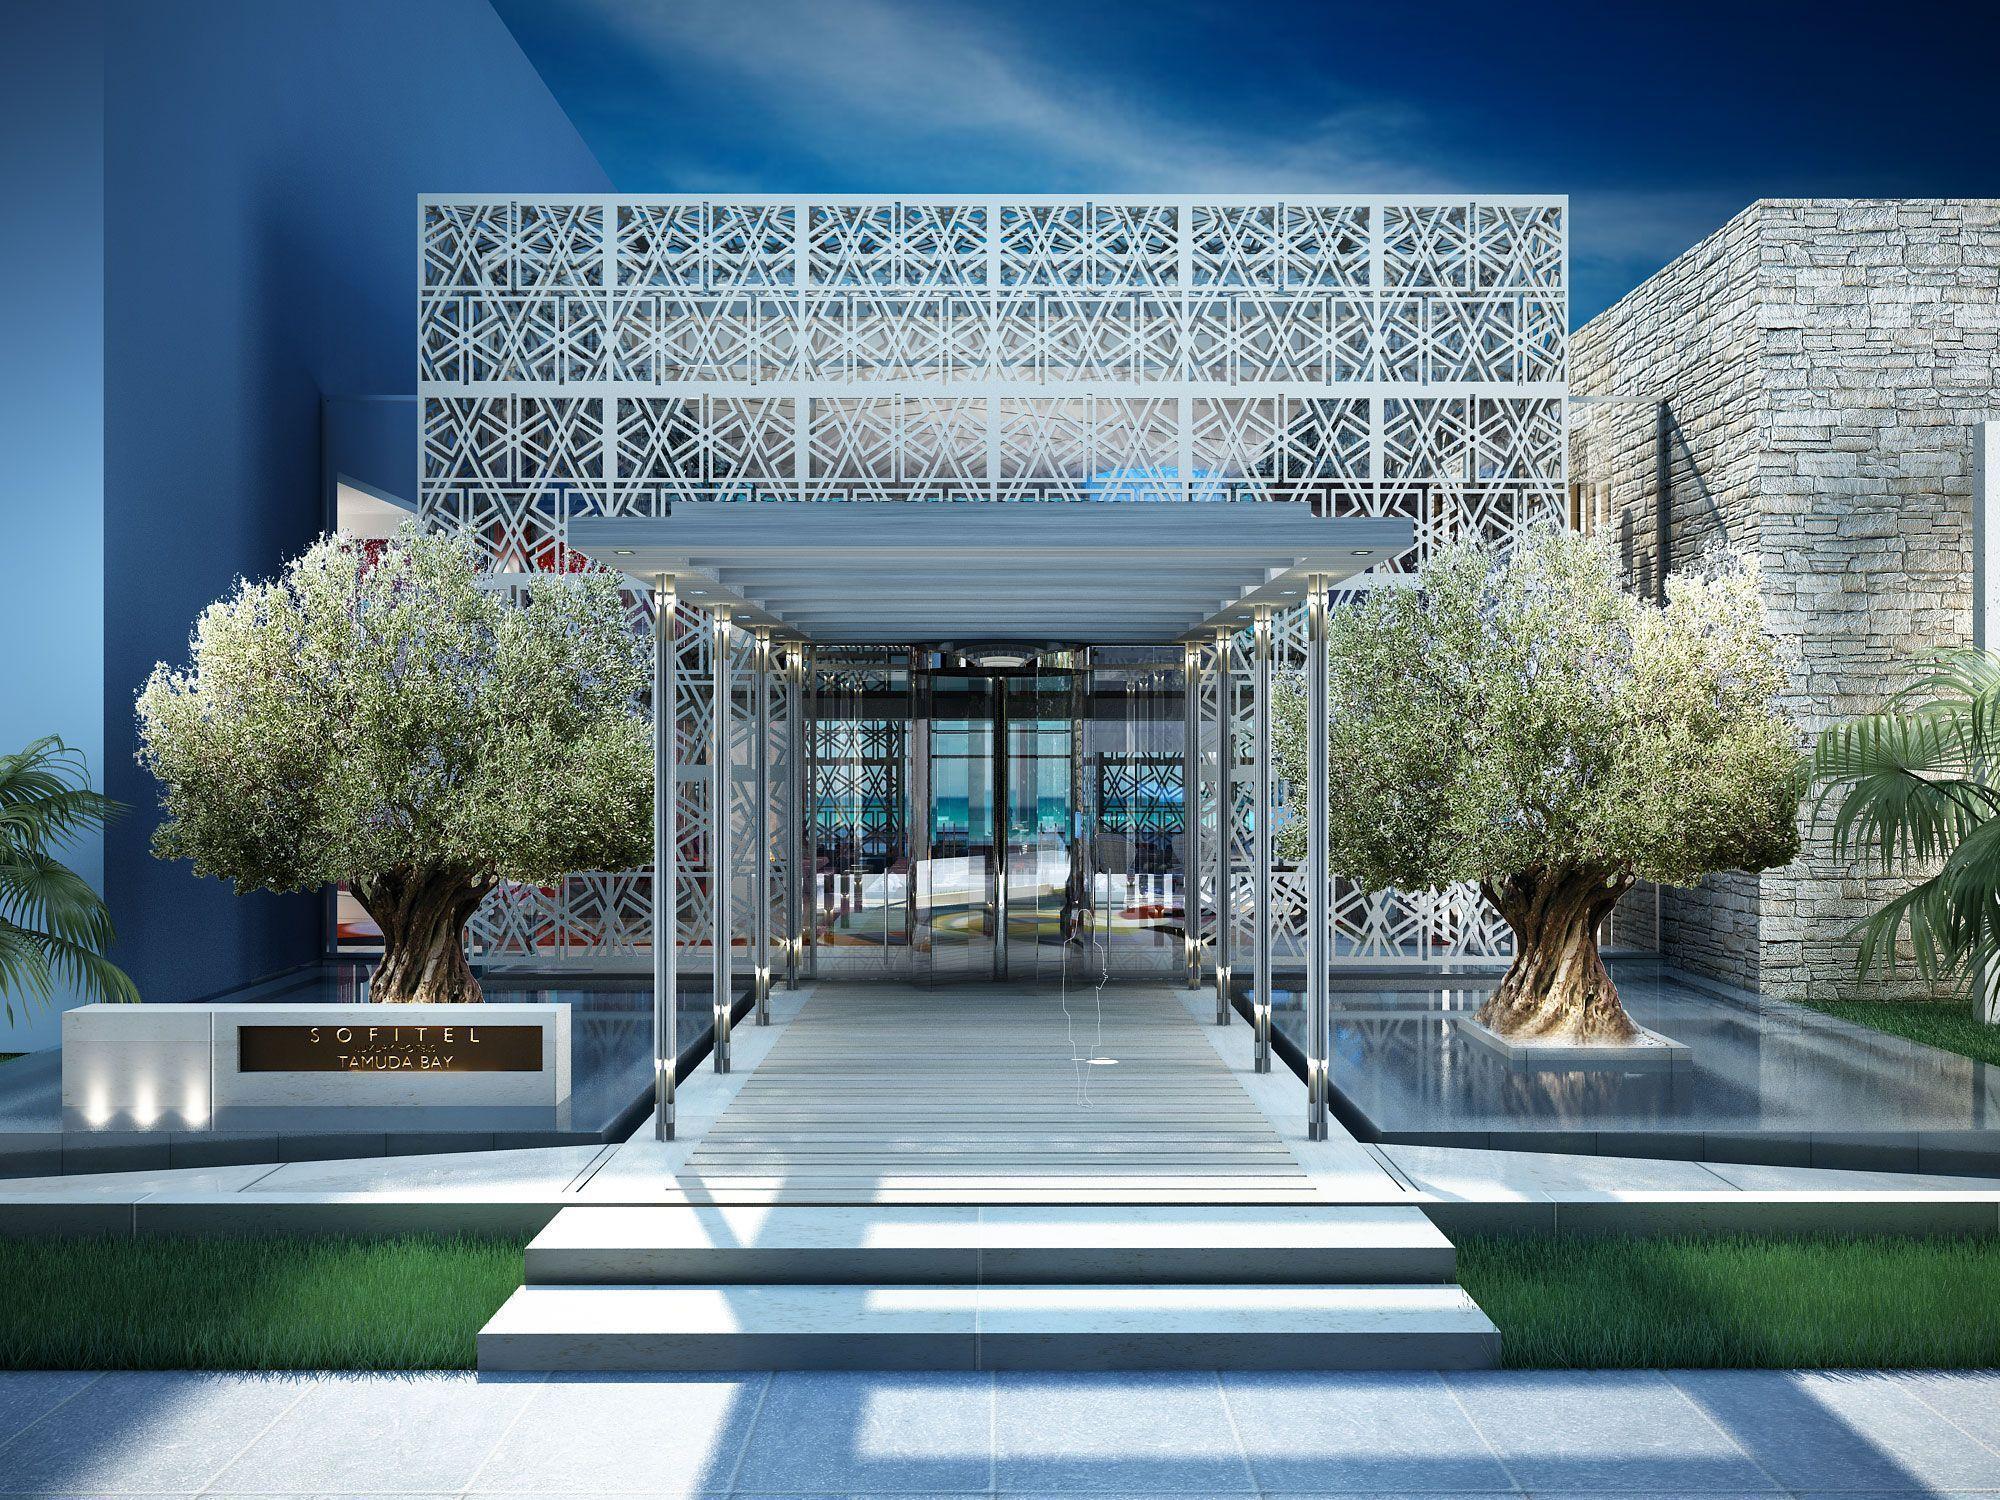 Modern architecture hotel entrance design africa sofitel tamuda bay hotel architecture glubdub showroomexteriordesign